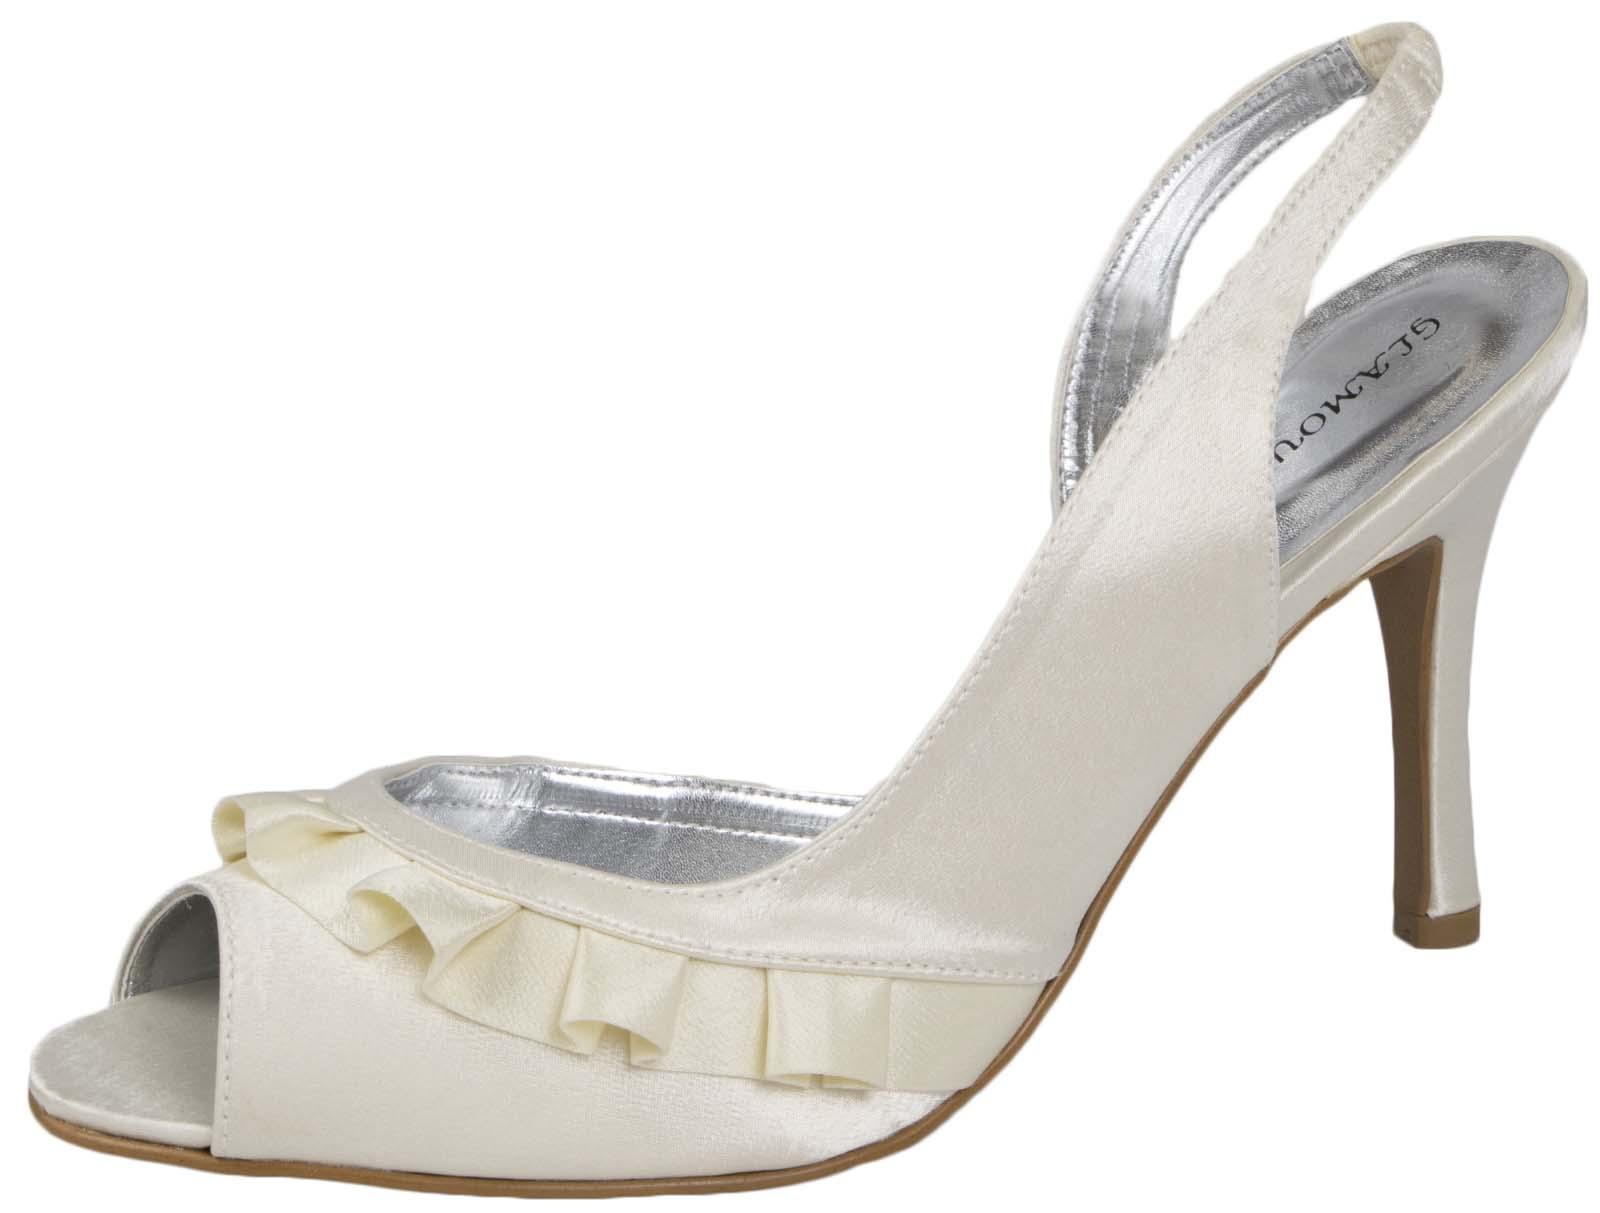 Womens Satin Bridal Wedding Shoes Ruffled Bridesmaids Sandals High Heels Size